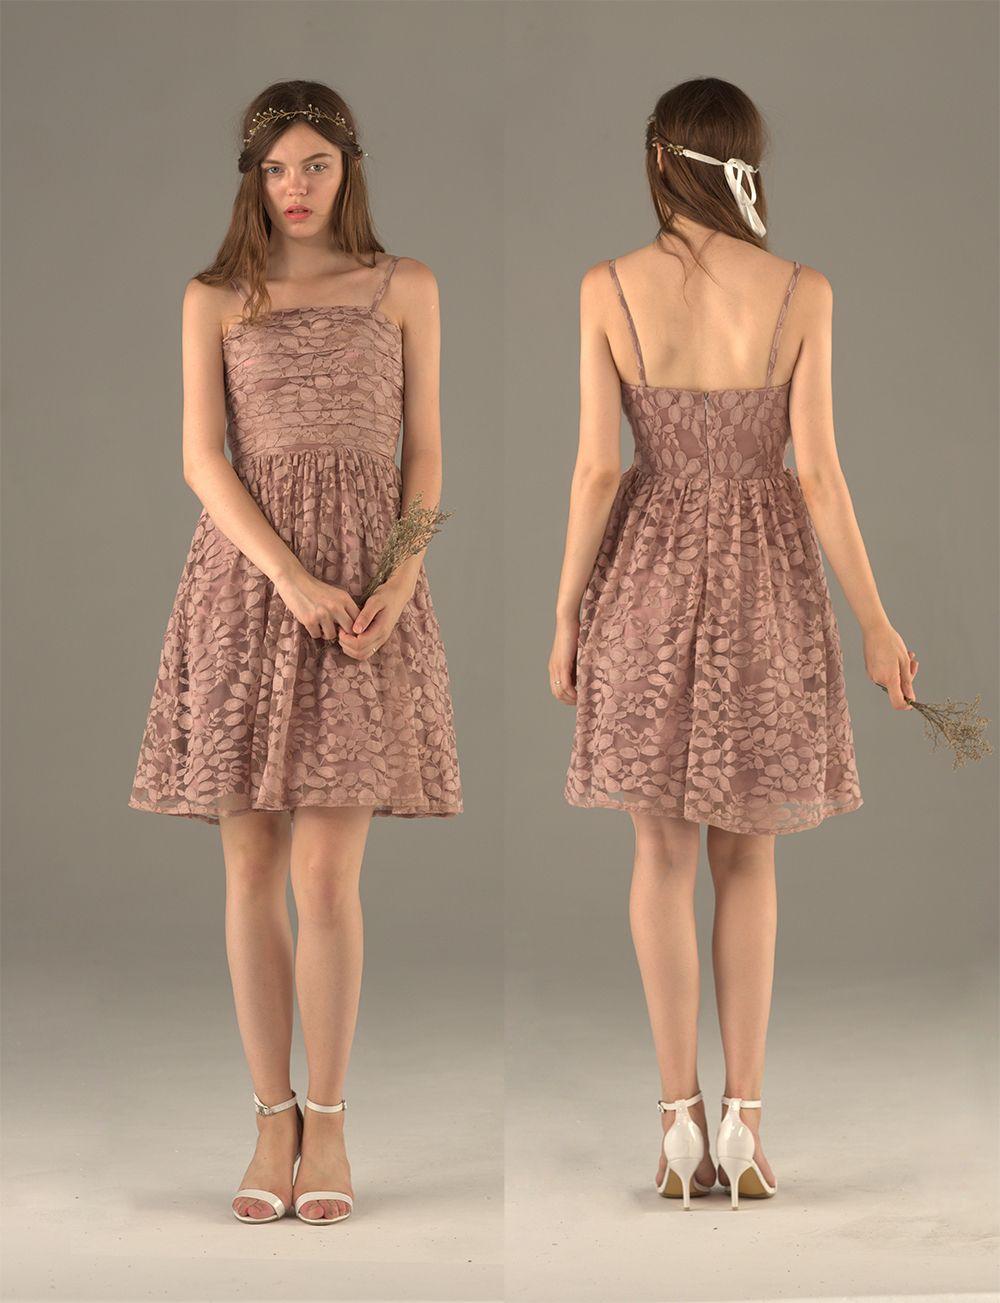 Dusty rose bridesmaid dress spaghetti strap lace evening dress